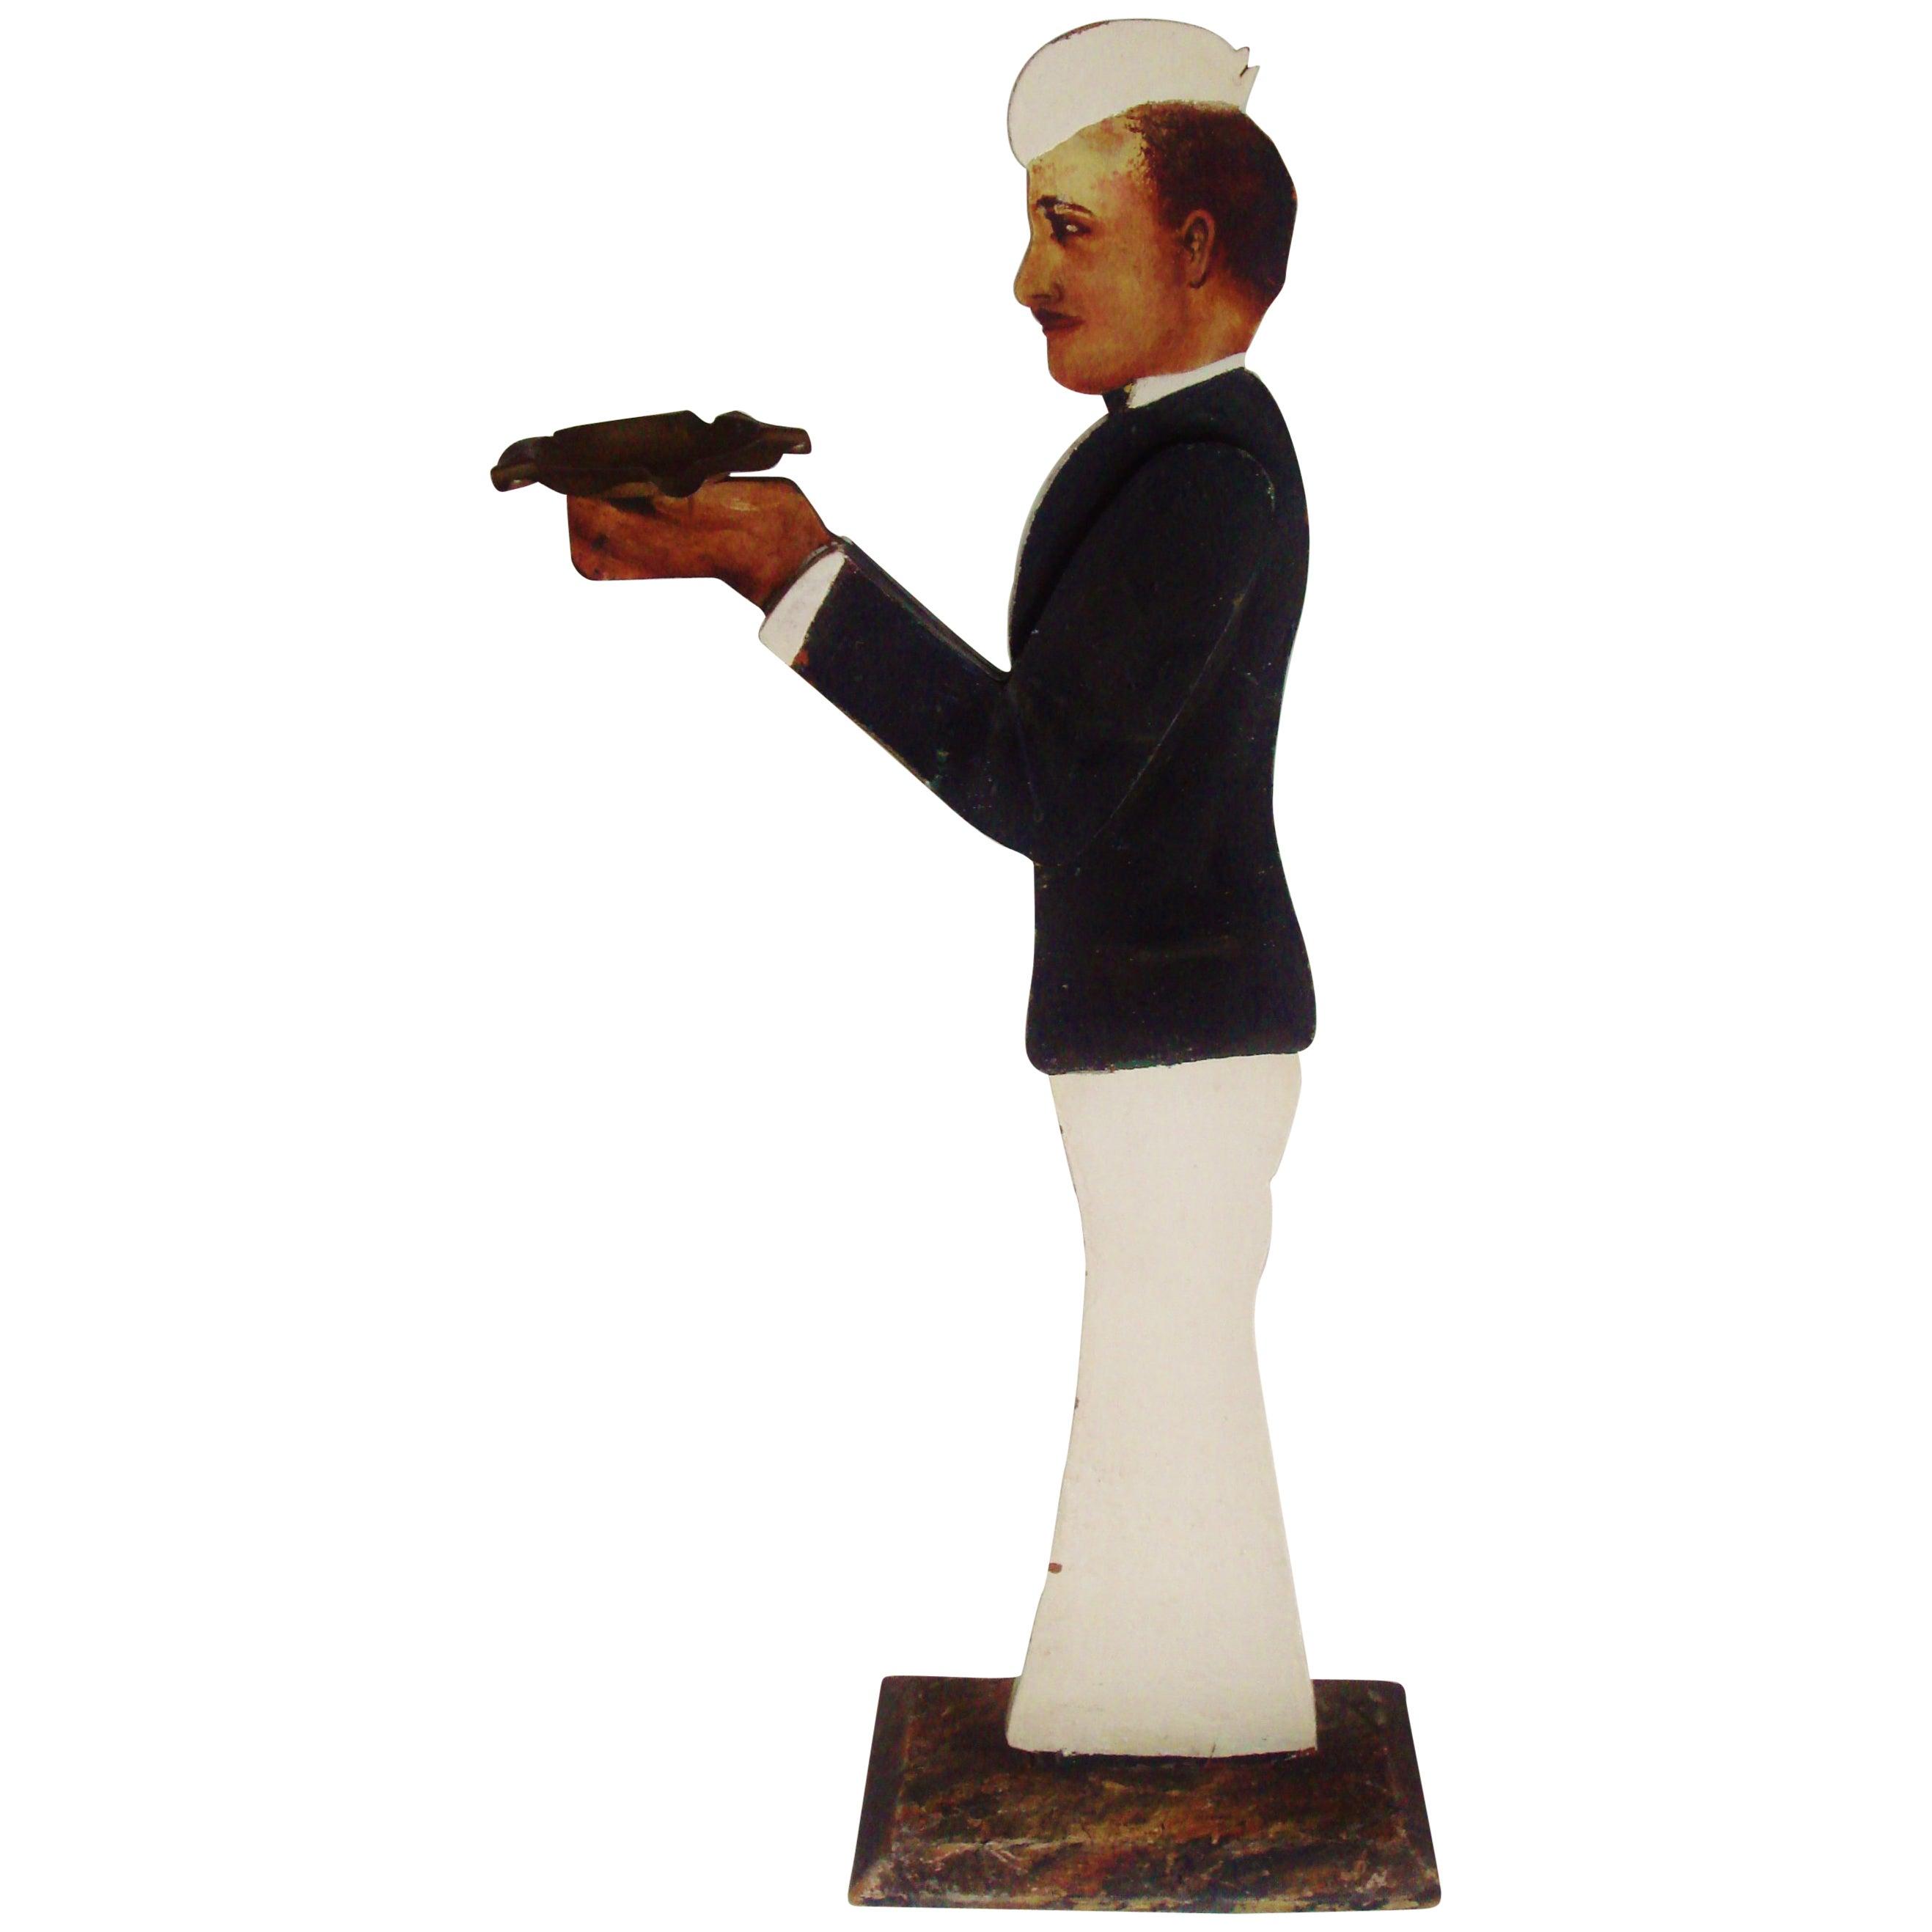 American Art Deco Figurative Soda-Jerk Folk Art Wood and Brass Ashtray Stand